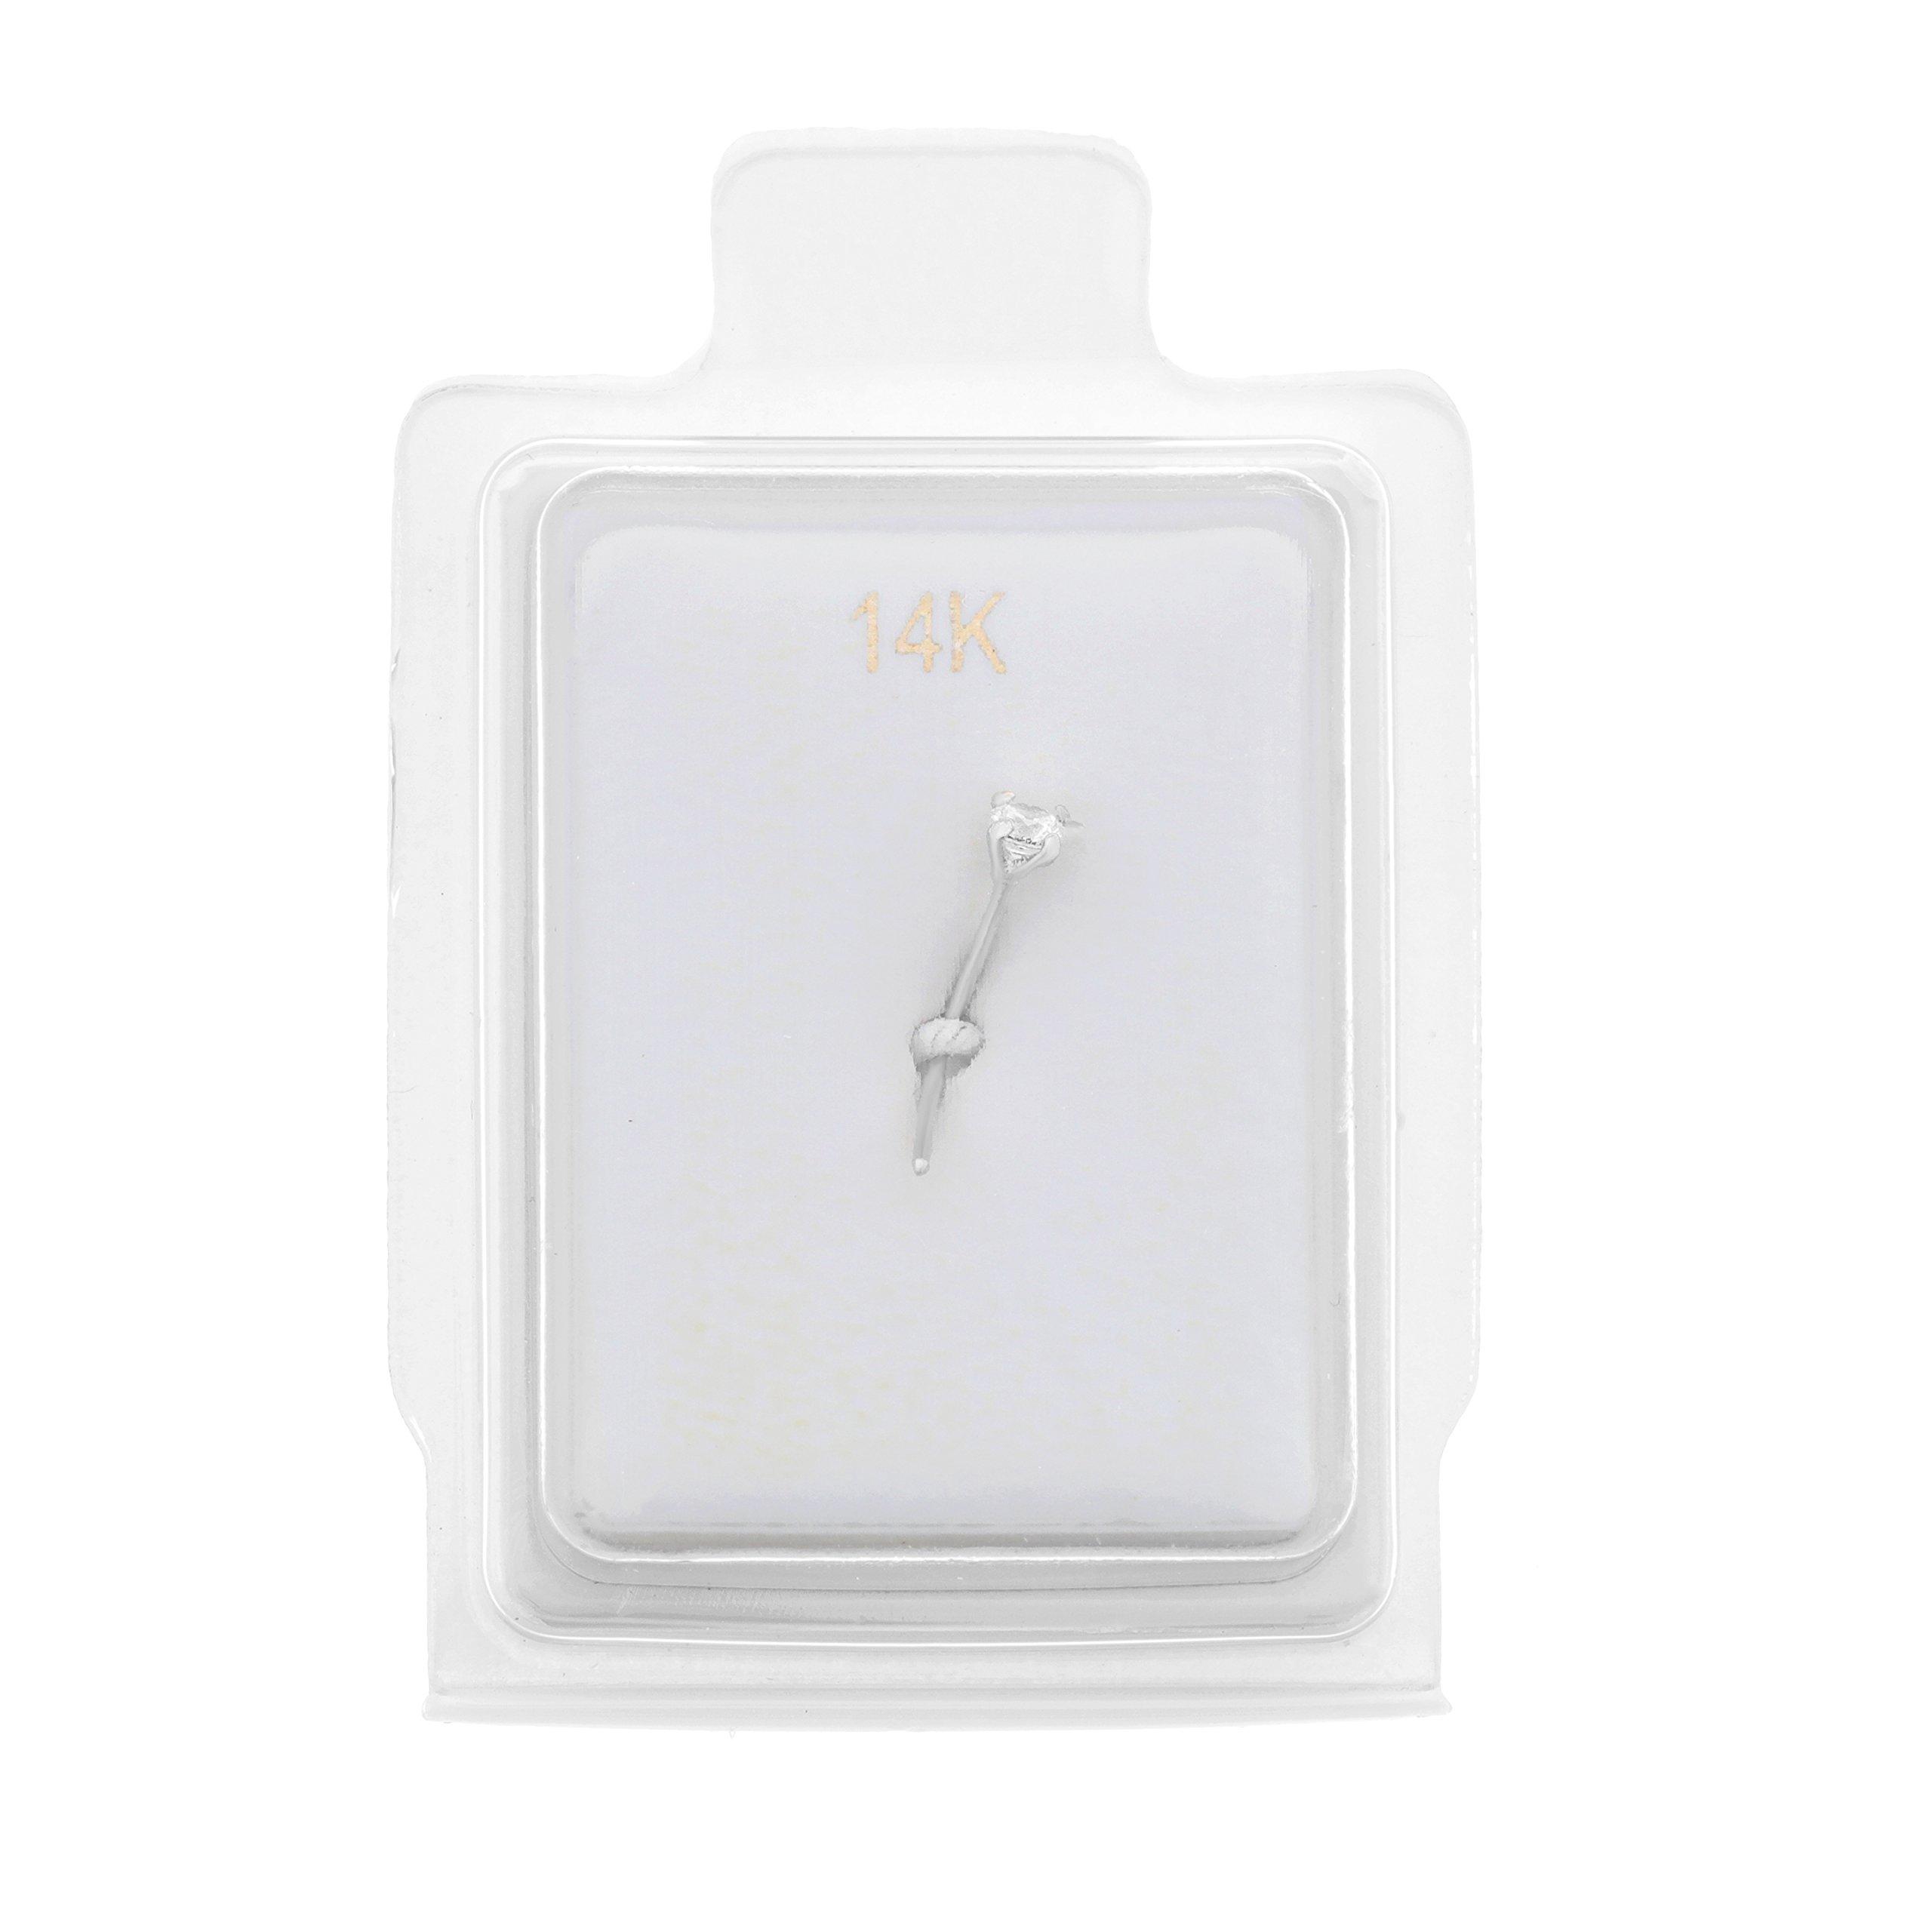 14K White Gold 2mm White Cubic Zirconium Nose Ring L-Shape 22G